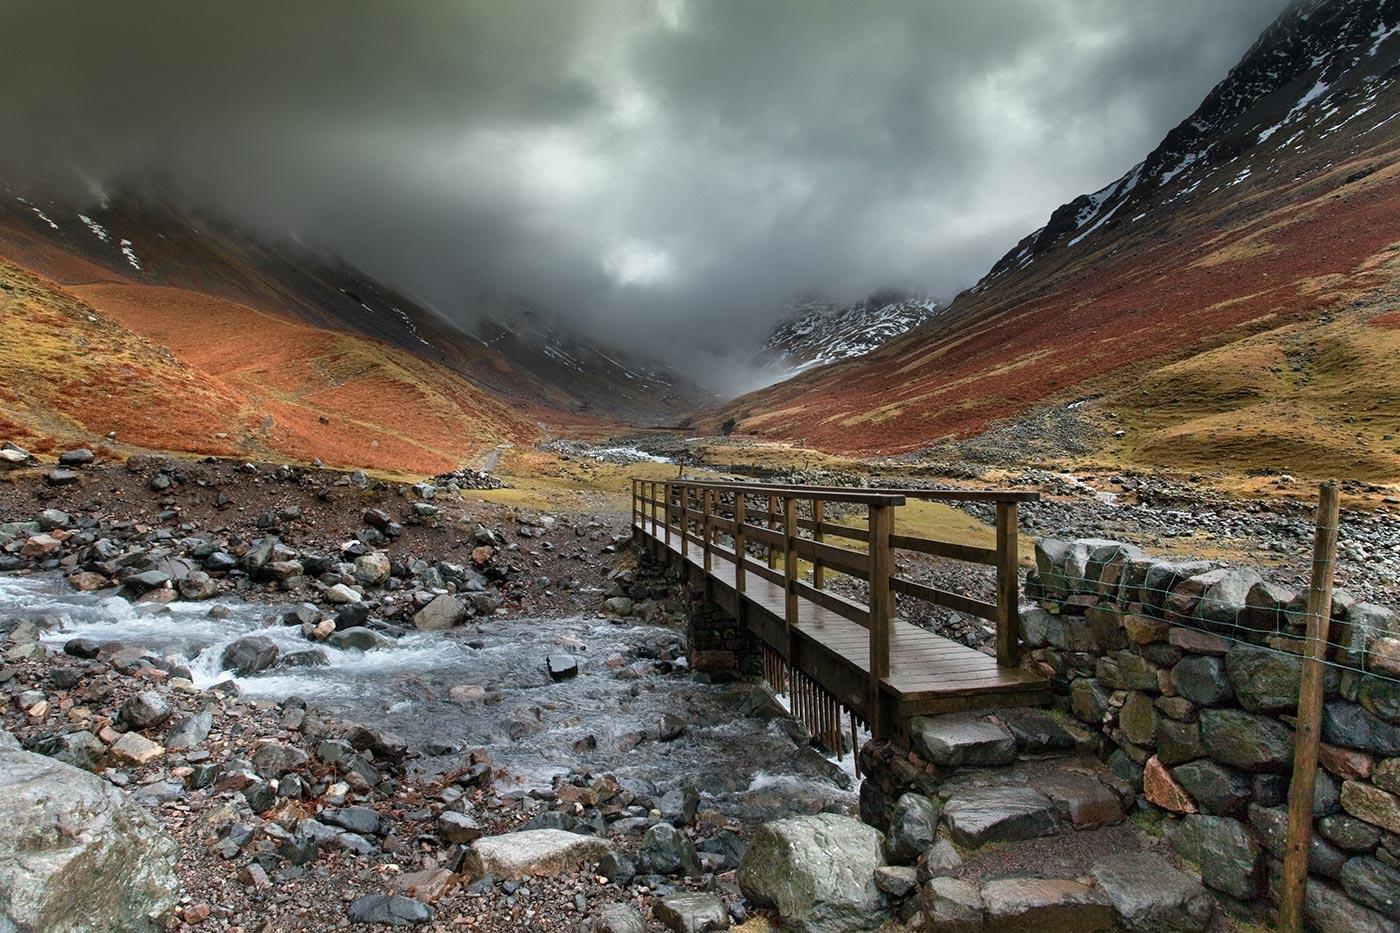 Gable-Beck-flows-under-the-bridge-as-the-way-to-Borrowdale-looks-bleak!.jpg